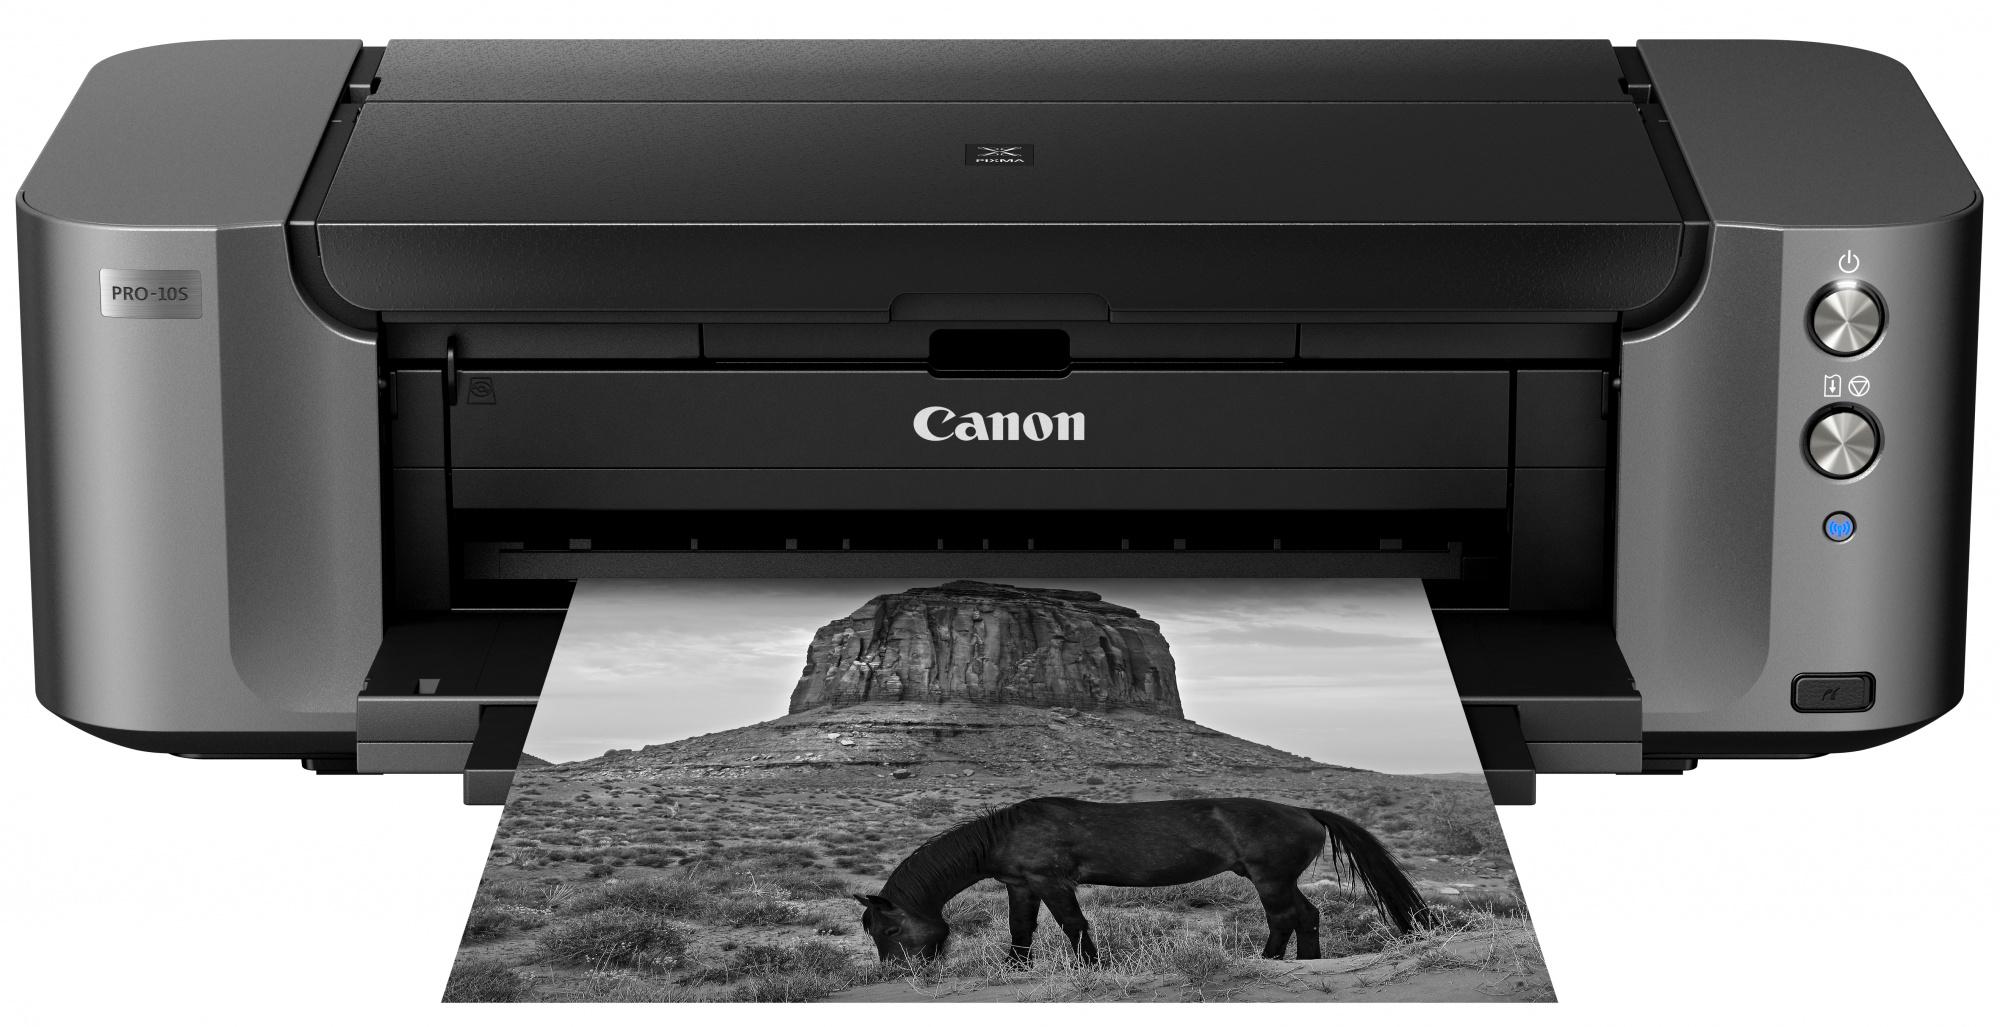 PIXMA струйный принтер canon pixma pro 10s 9983b009